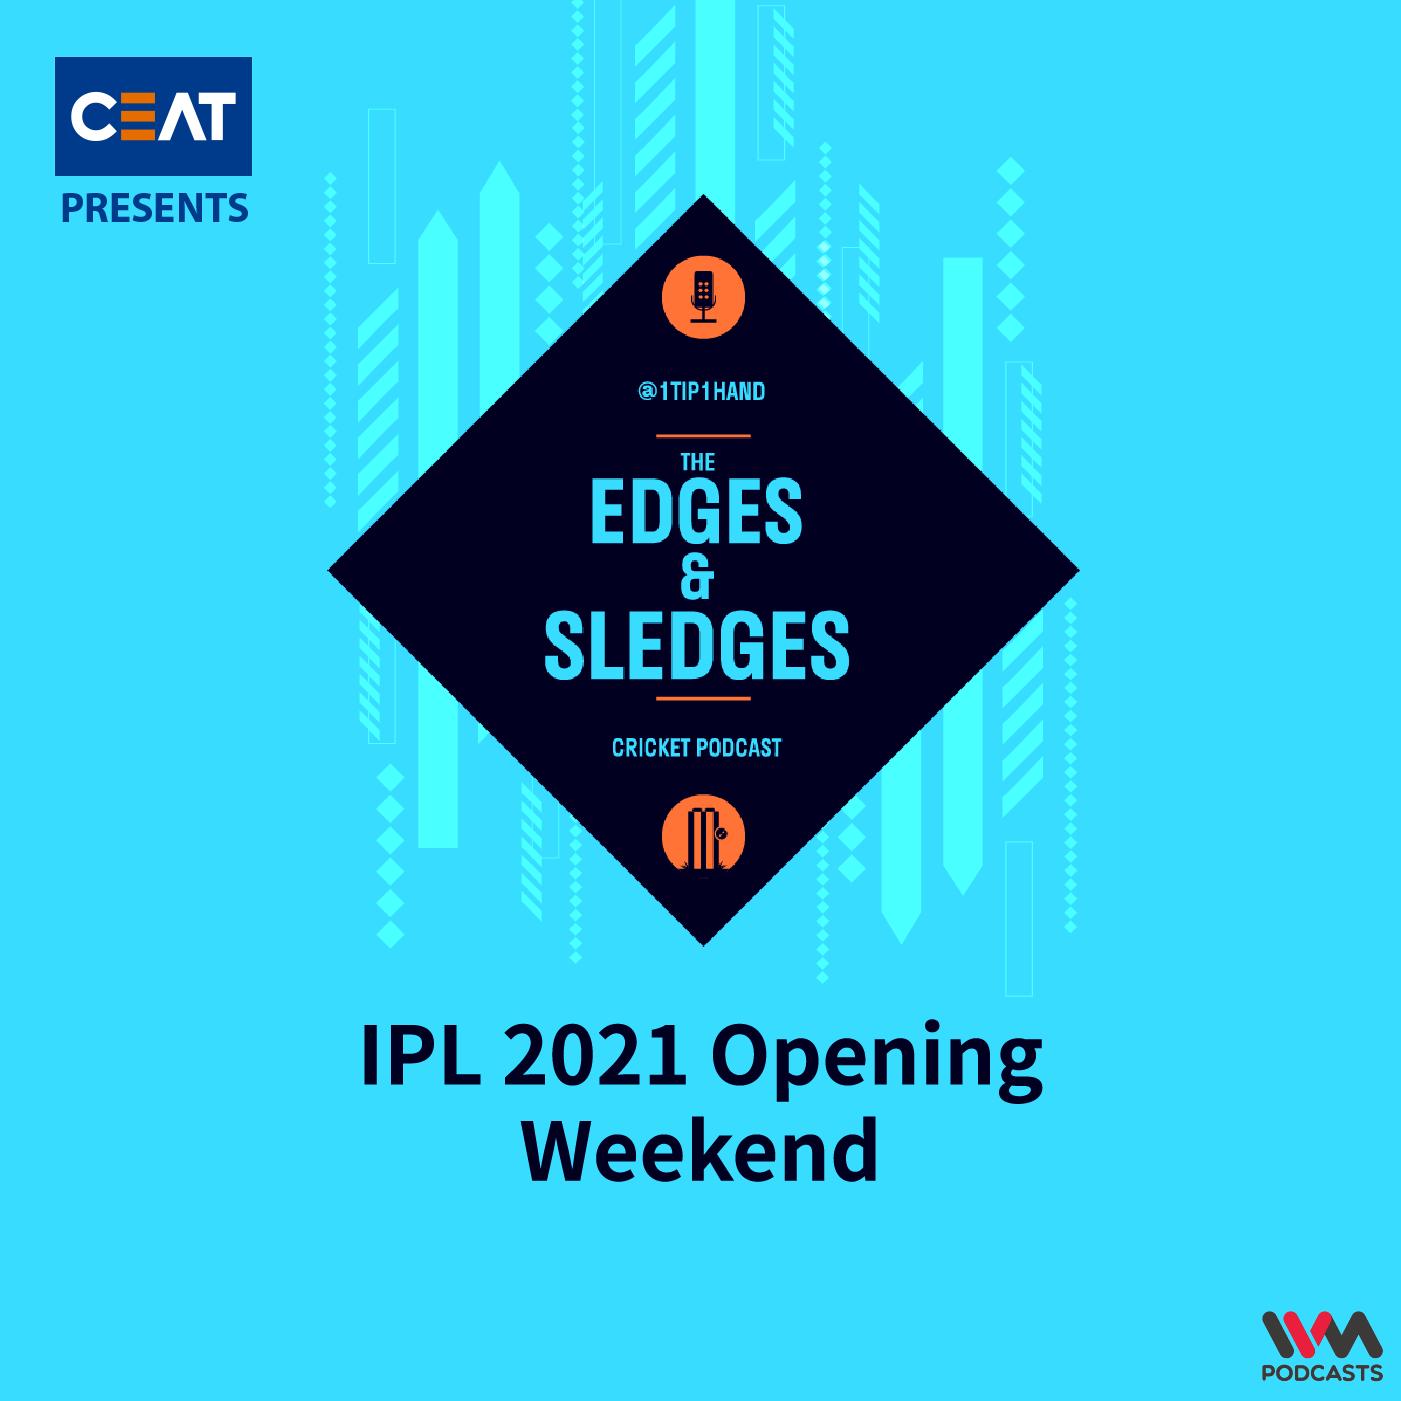 Ep. 166: IPL 2021 Opening Weekend